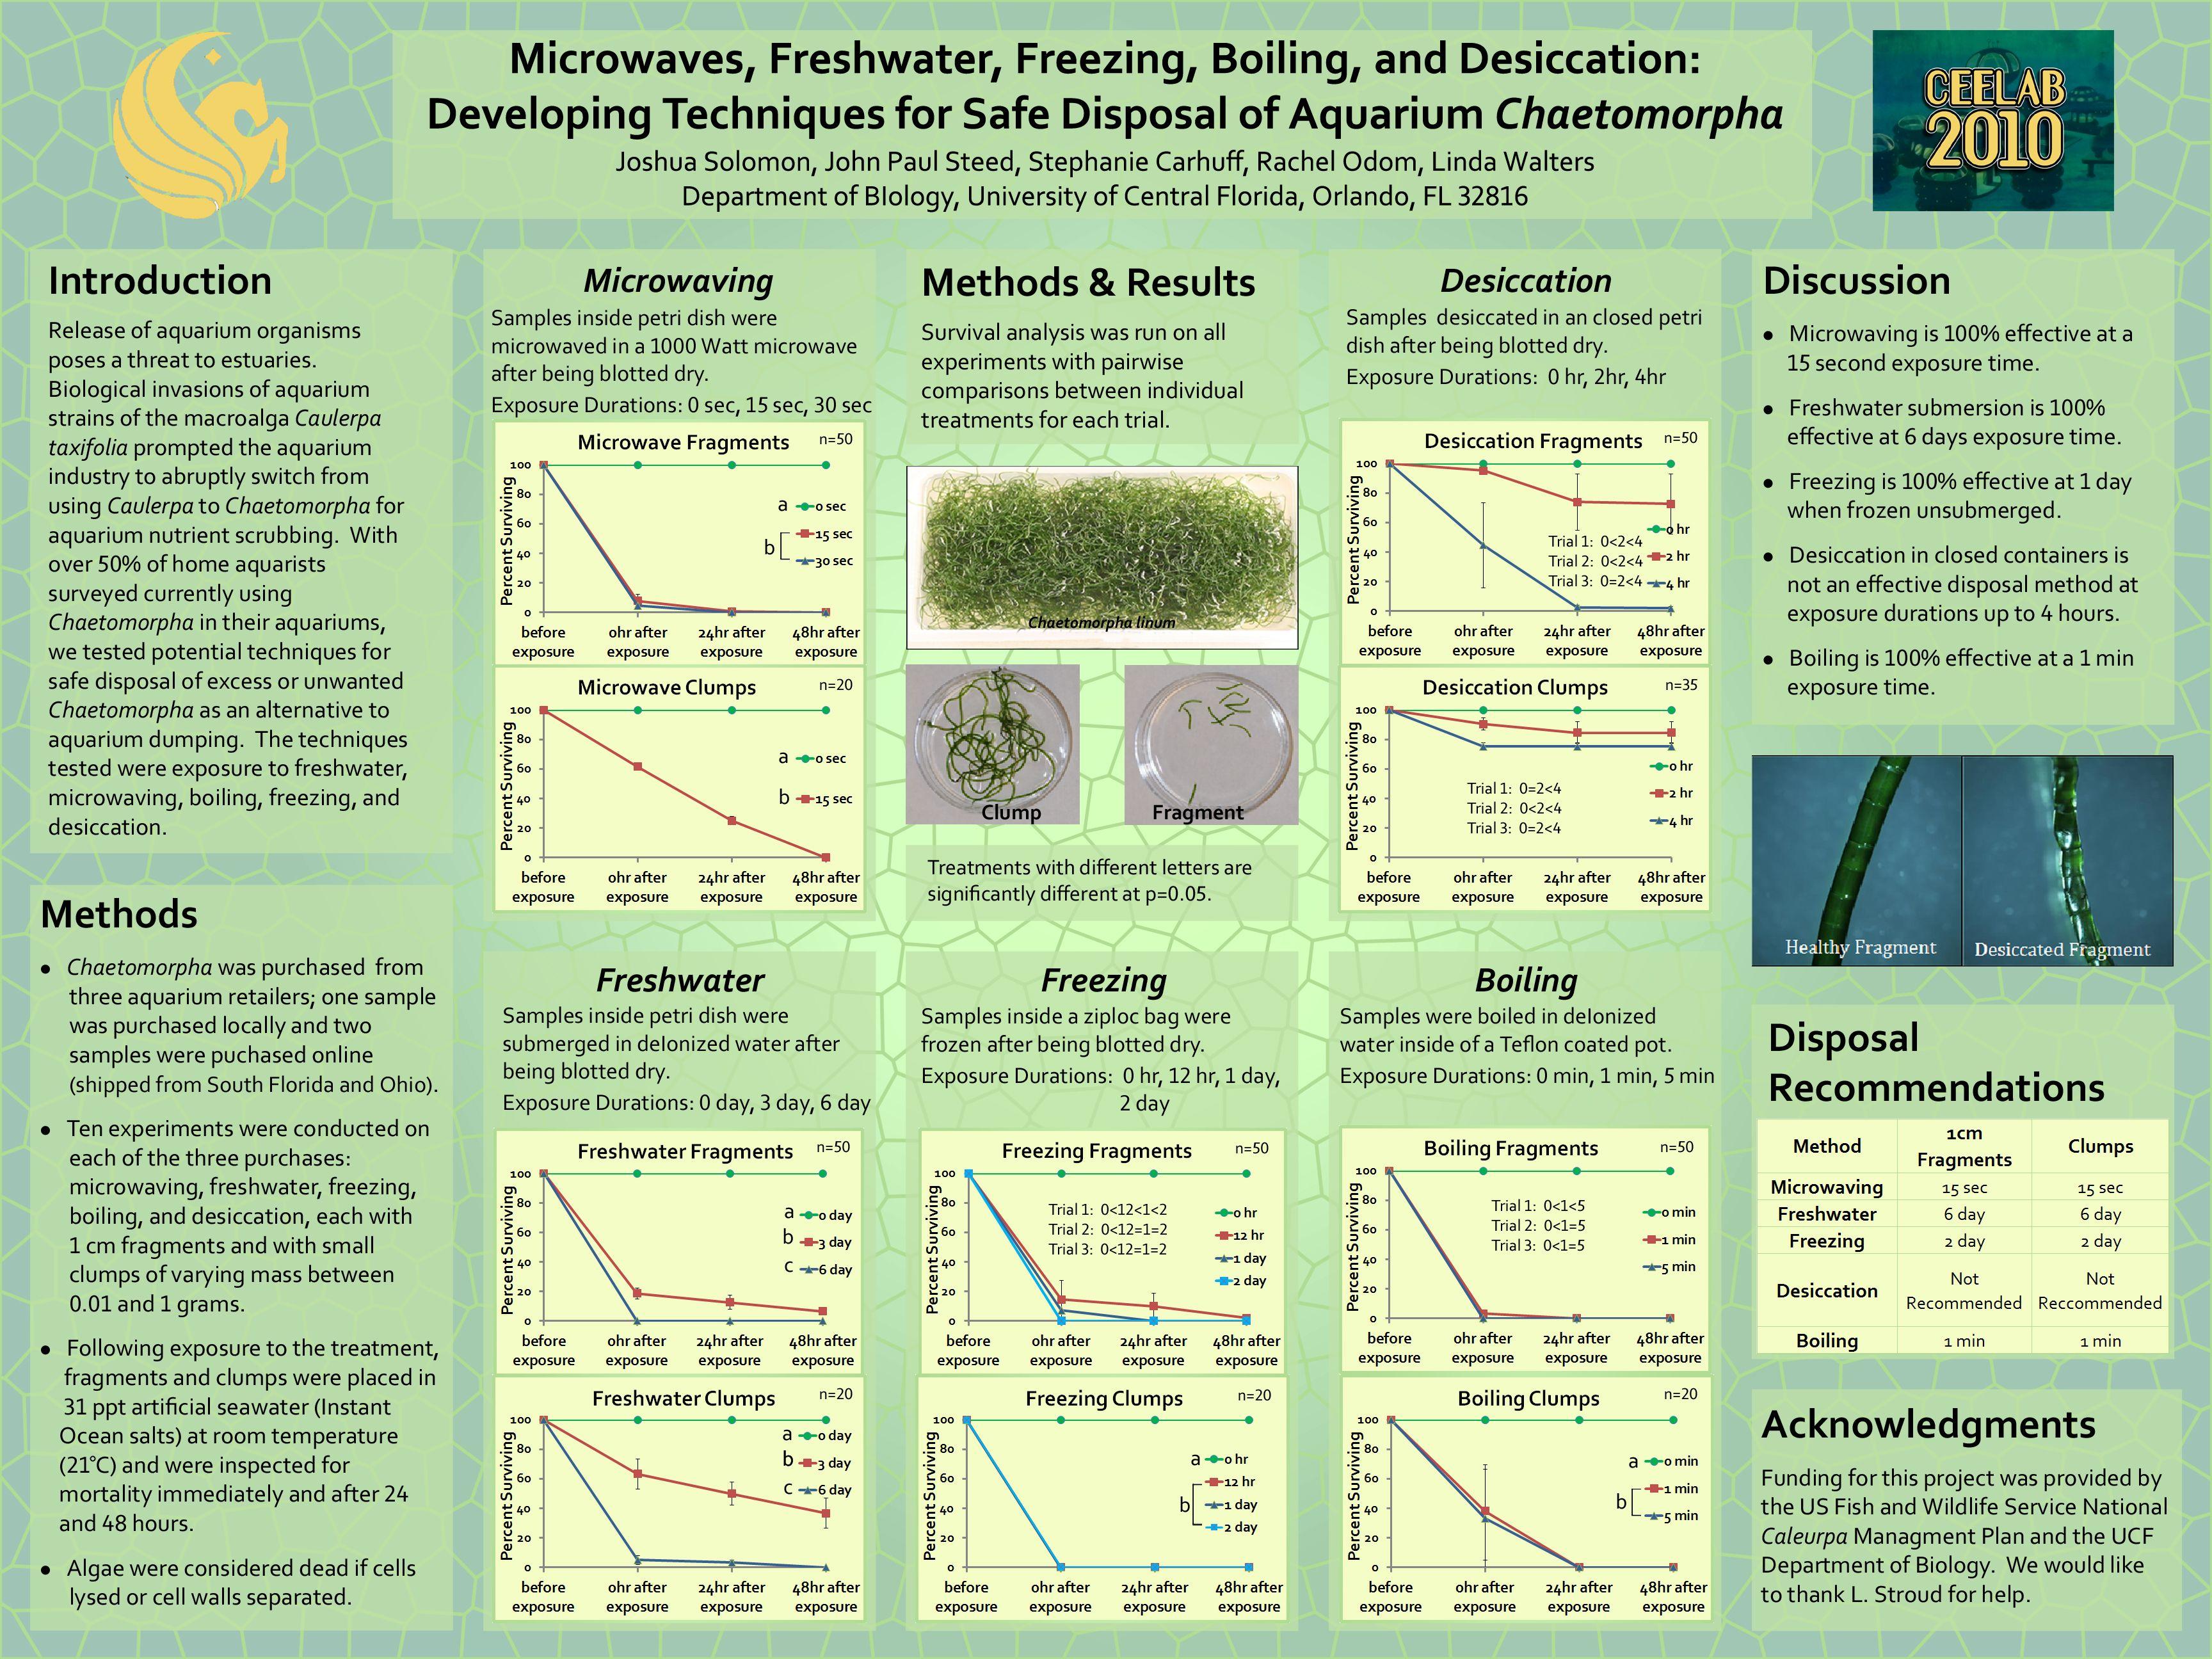 Solomon Jpg 3456 2592 Research Poster Scientific Design Presentation Ucf Thesi And Dissertation Services Service